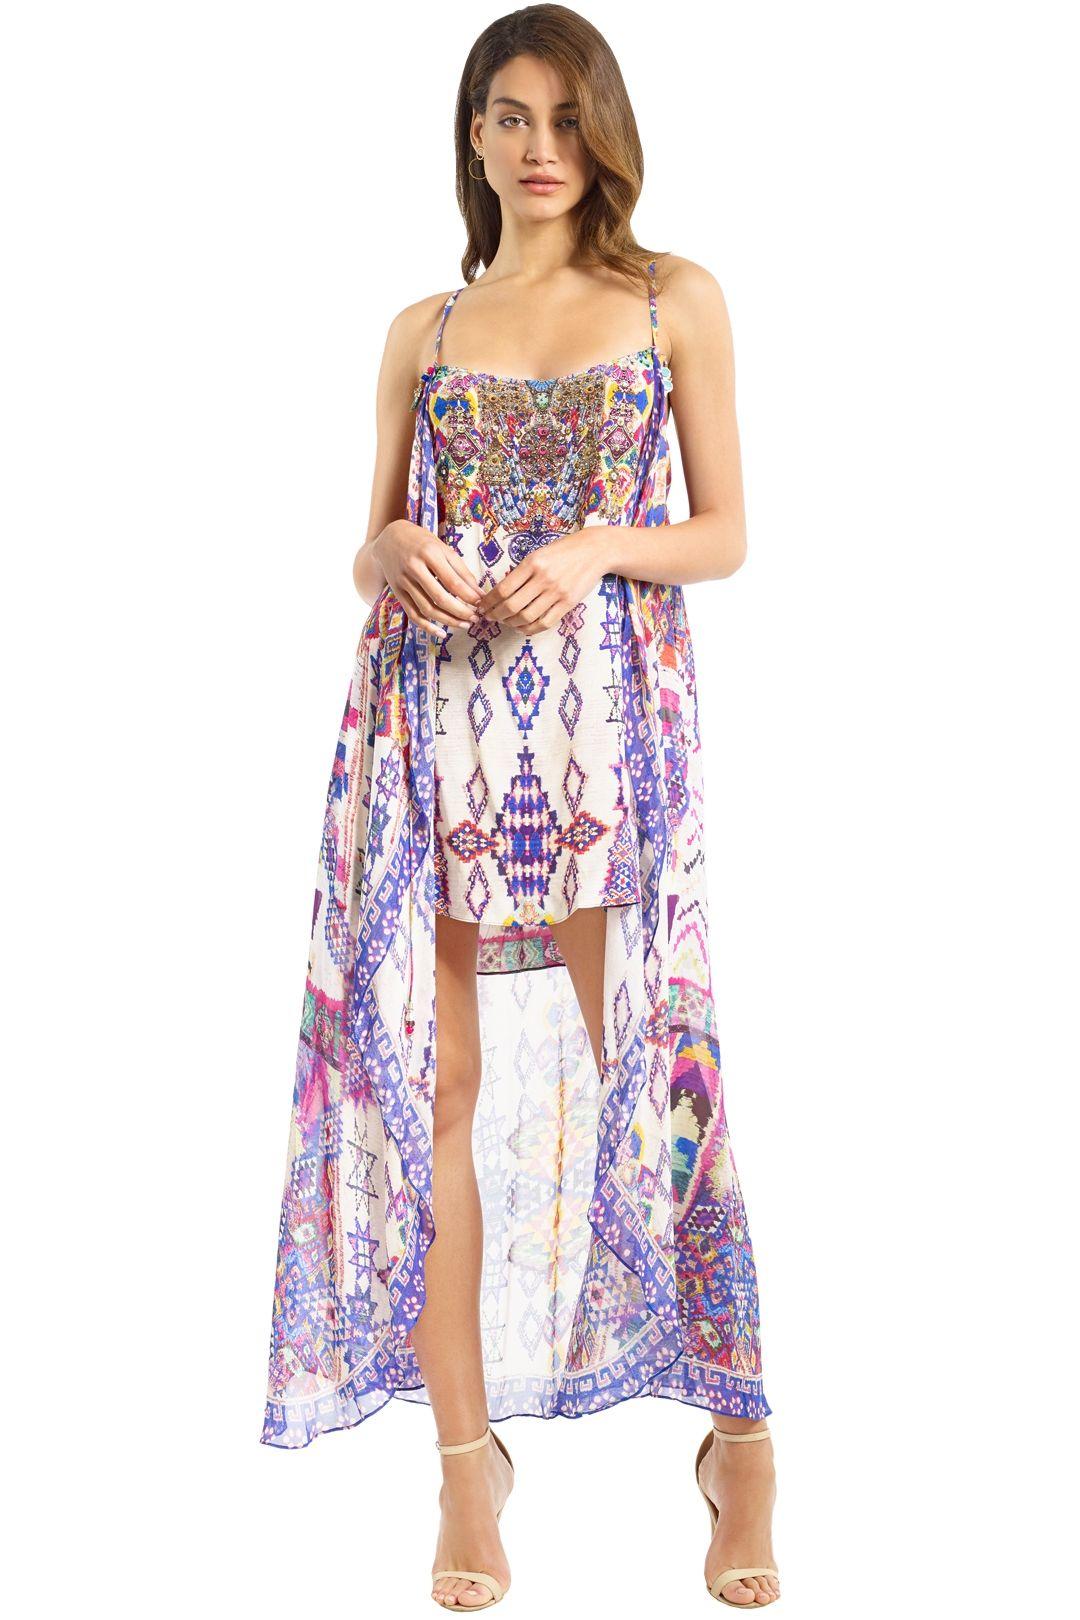 Camilla - Electric Aztec Dress - Purple Pink - Front